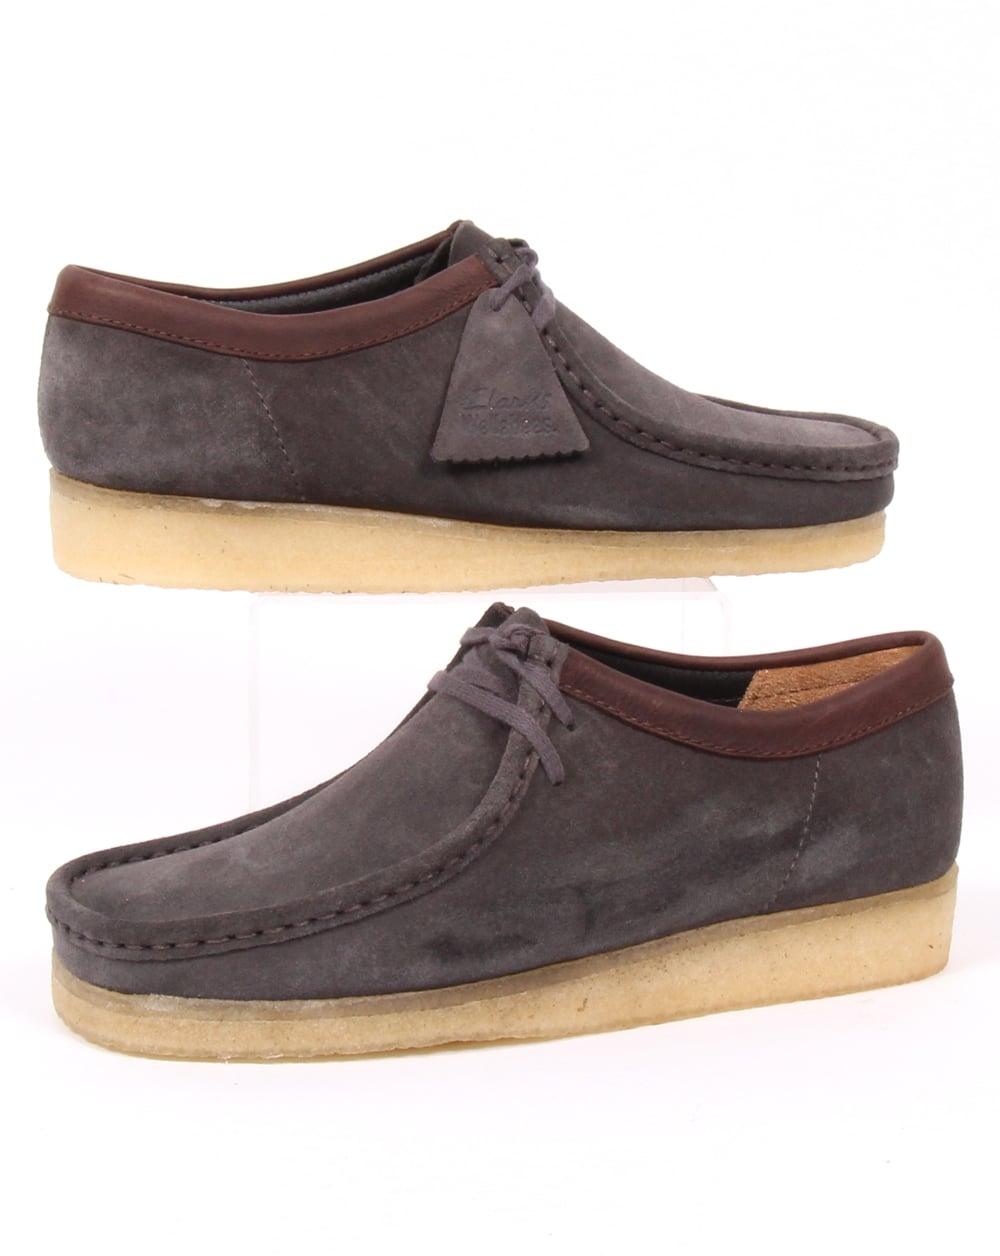 cea830d02 Clarks Originals Clarks Originals Wallabee Shoes Charcoal Suede